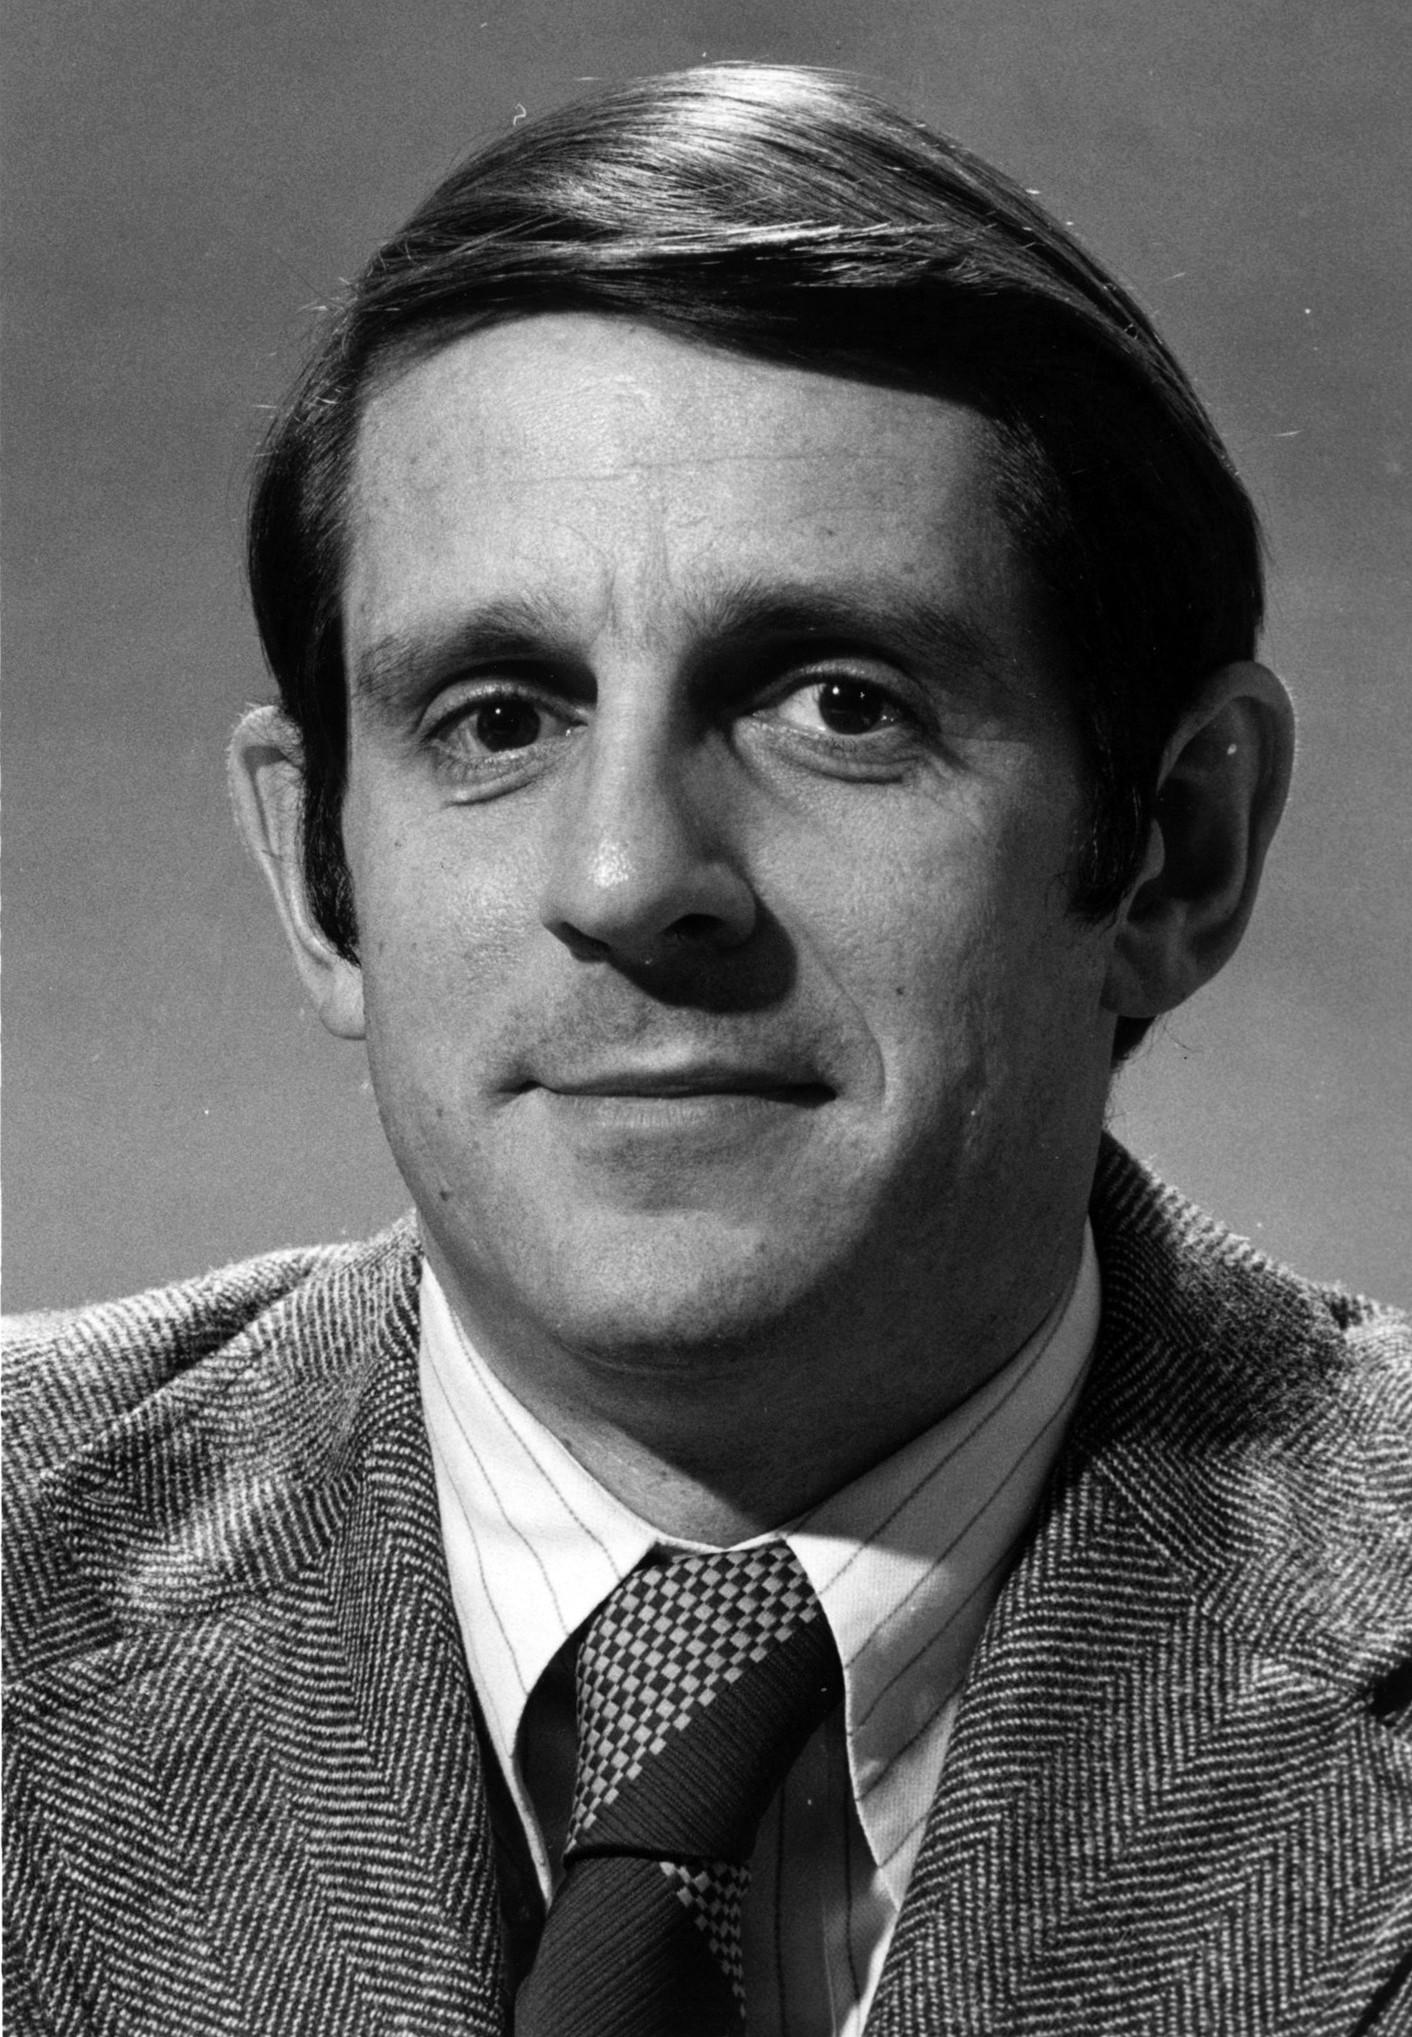 Chicago Tribune sports editor Dick Leslie.